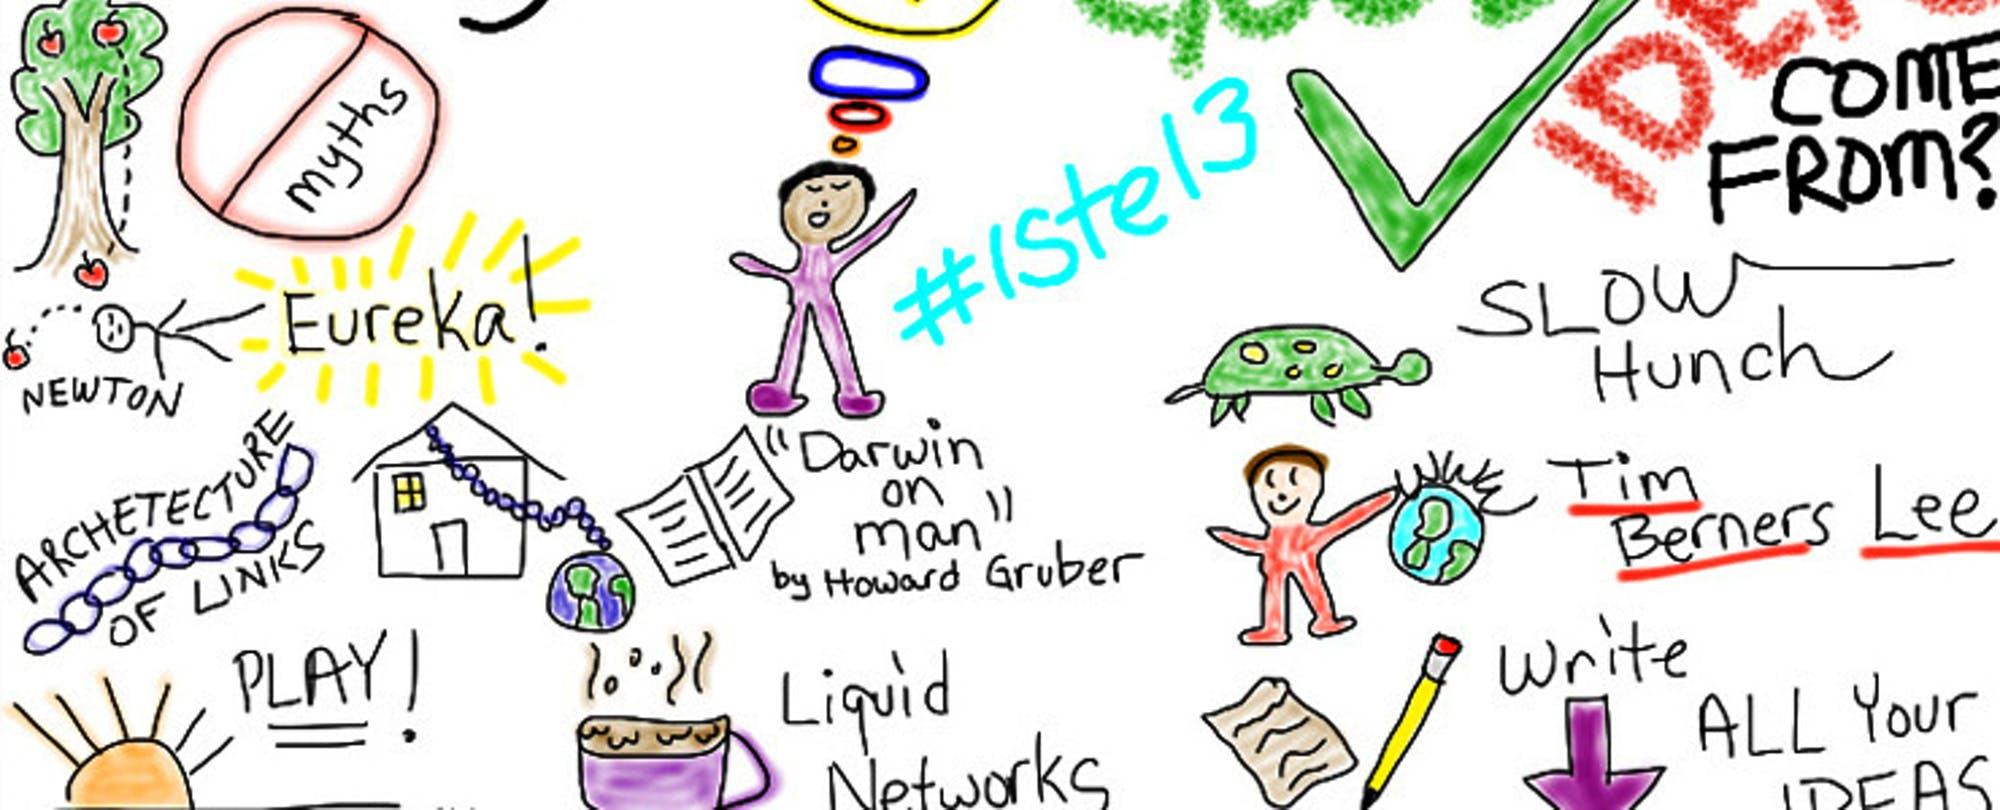 Where Good Ideas Happen: Stephen Johnson Gets Us Thinking at ISTE13